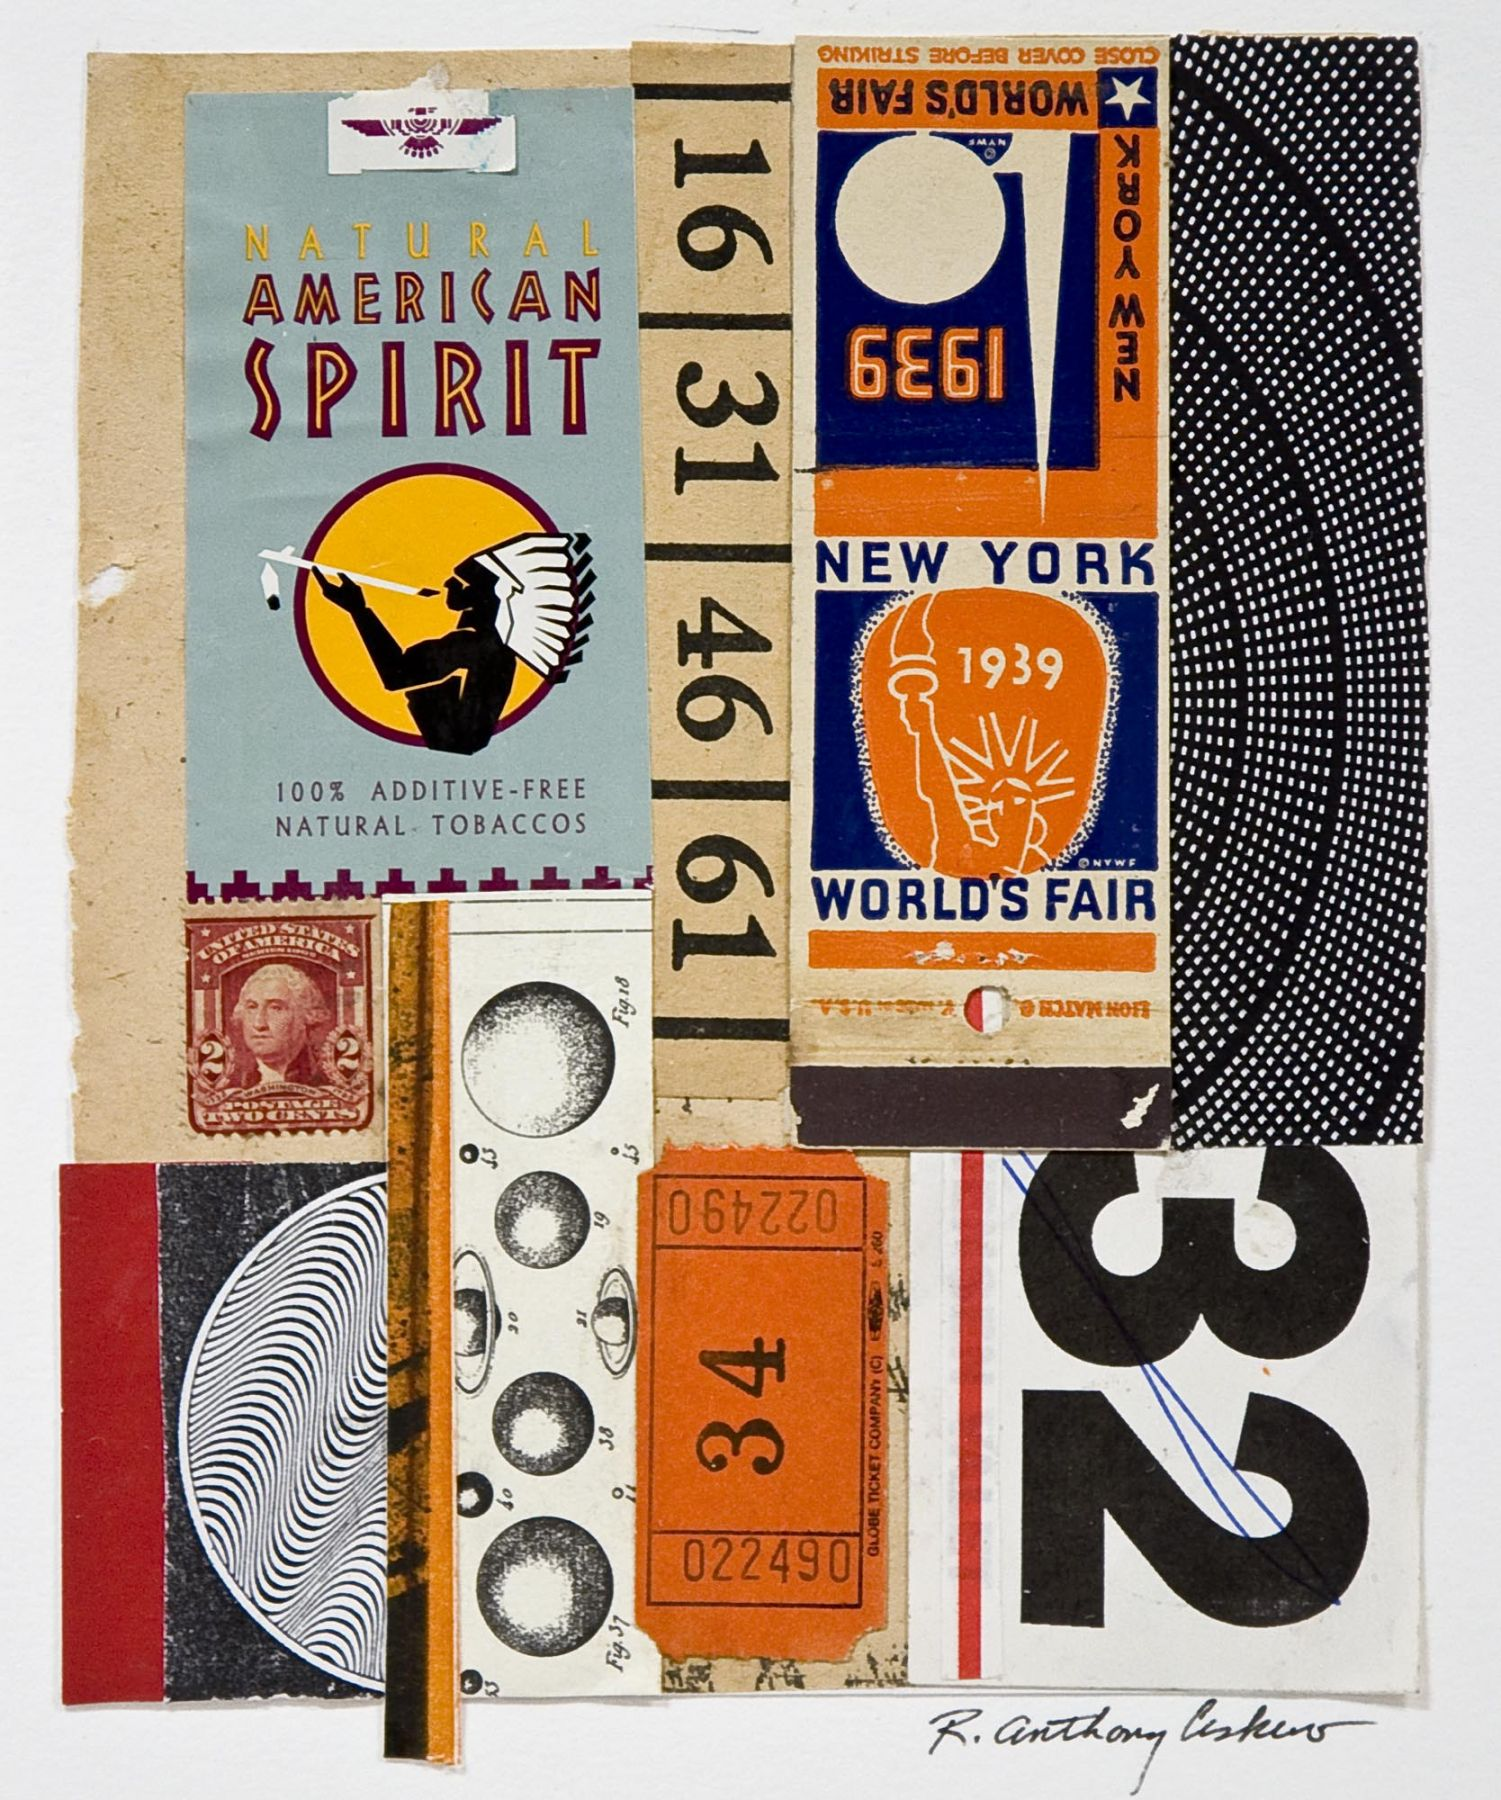 Tony Askew, 1939 World's Fair, 2018